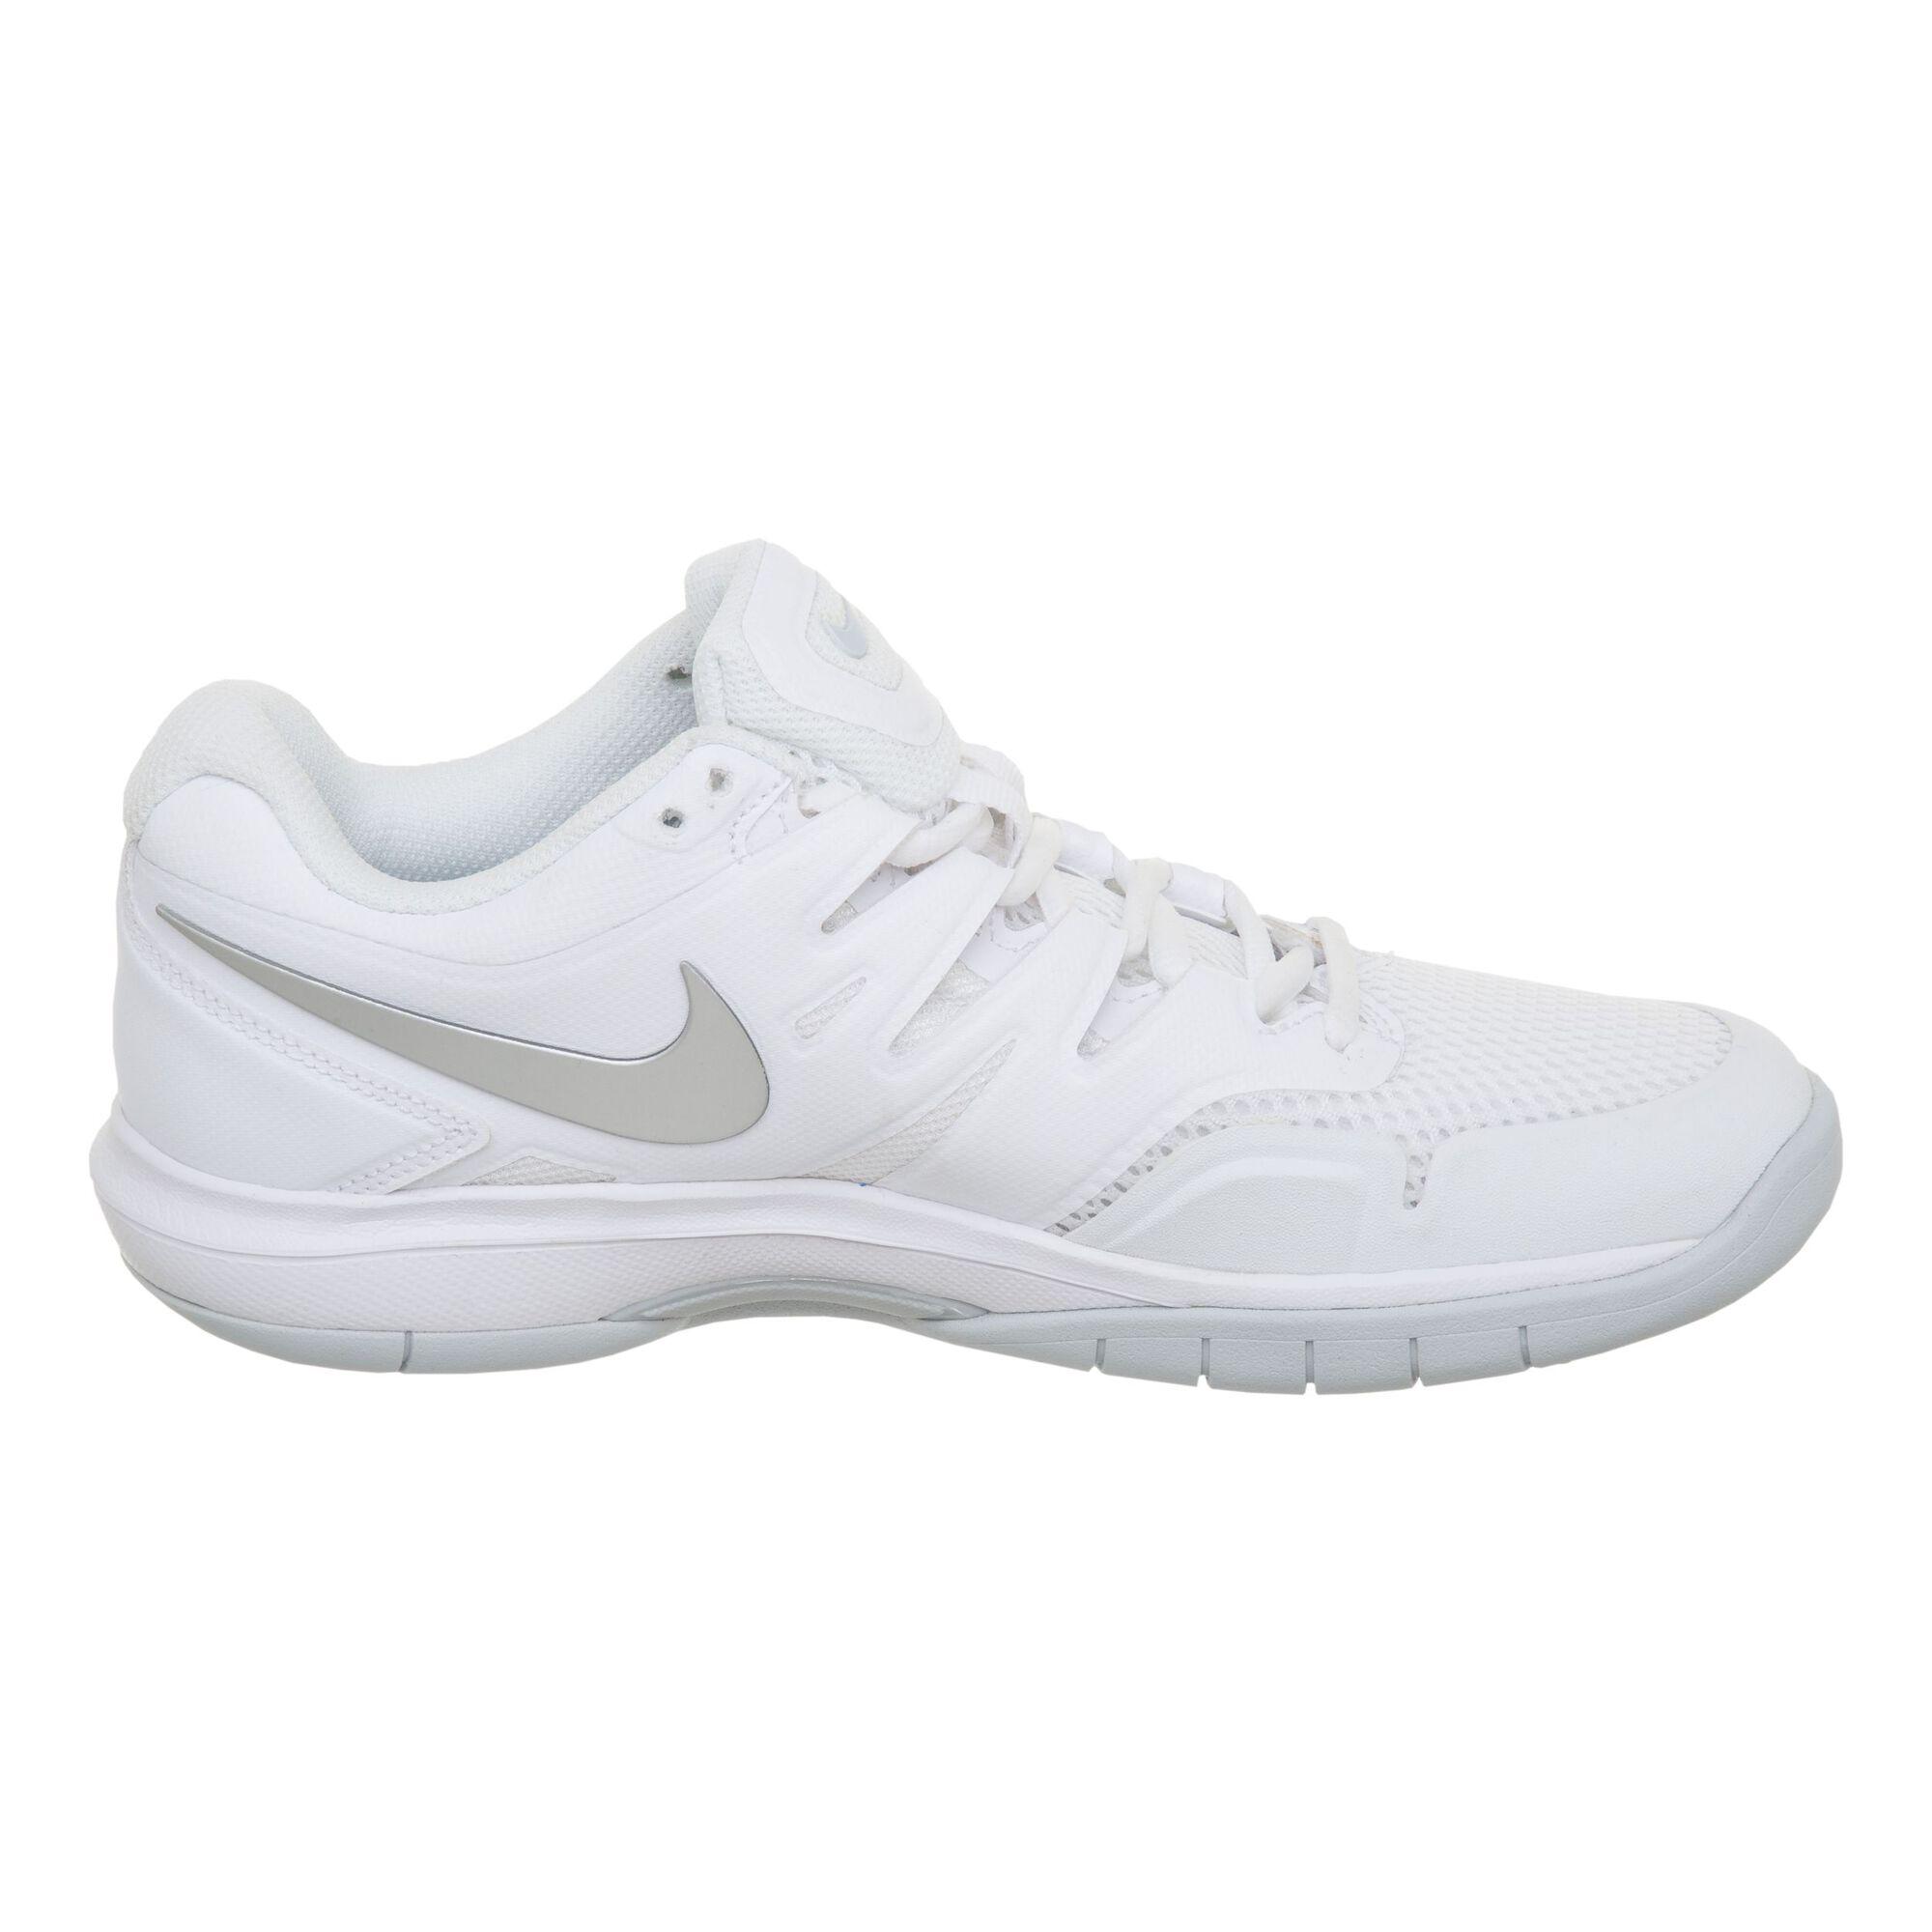 7dfbe1dc4ed1f Nike Air Zoom Prestige Carpet Teppichschuh Damen - Weiß, Grau online ...